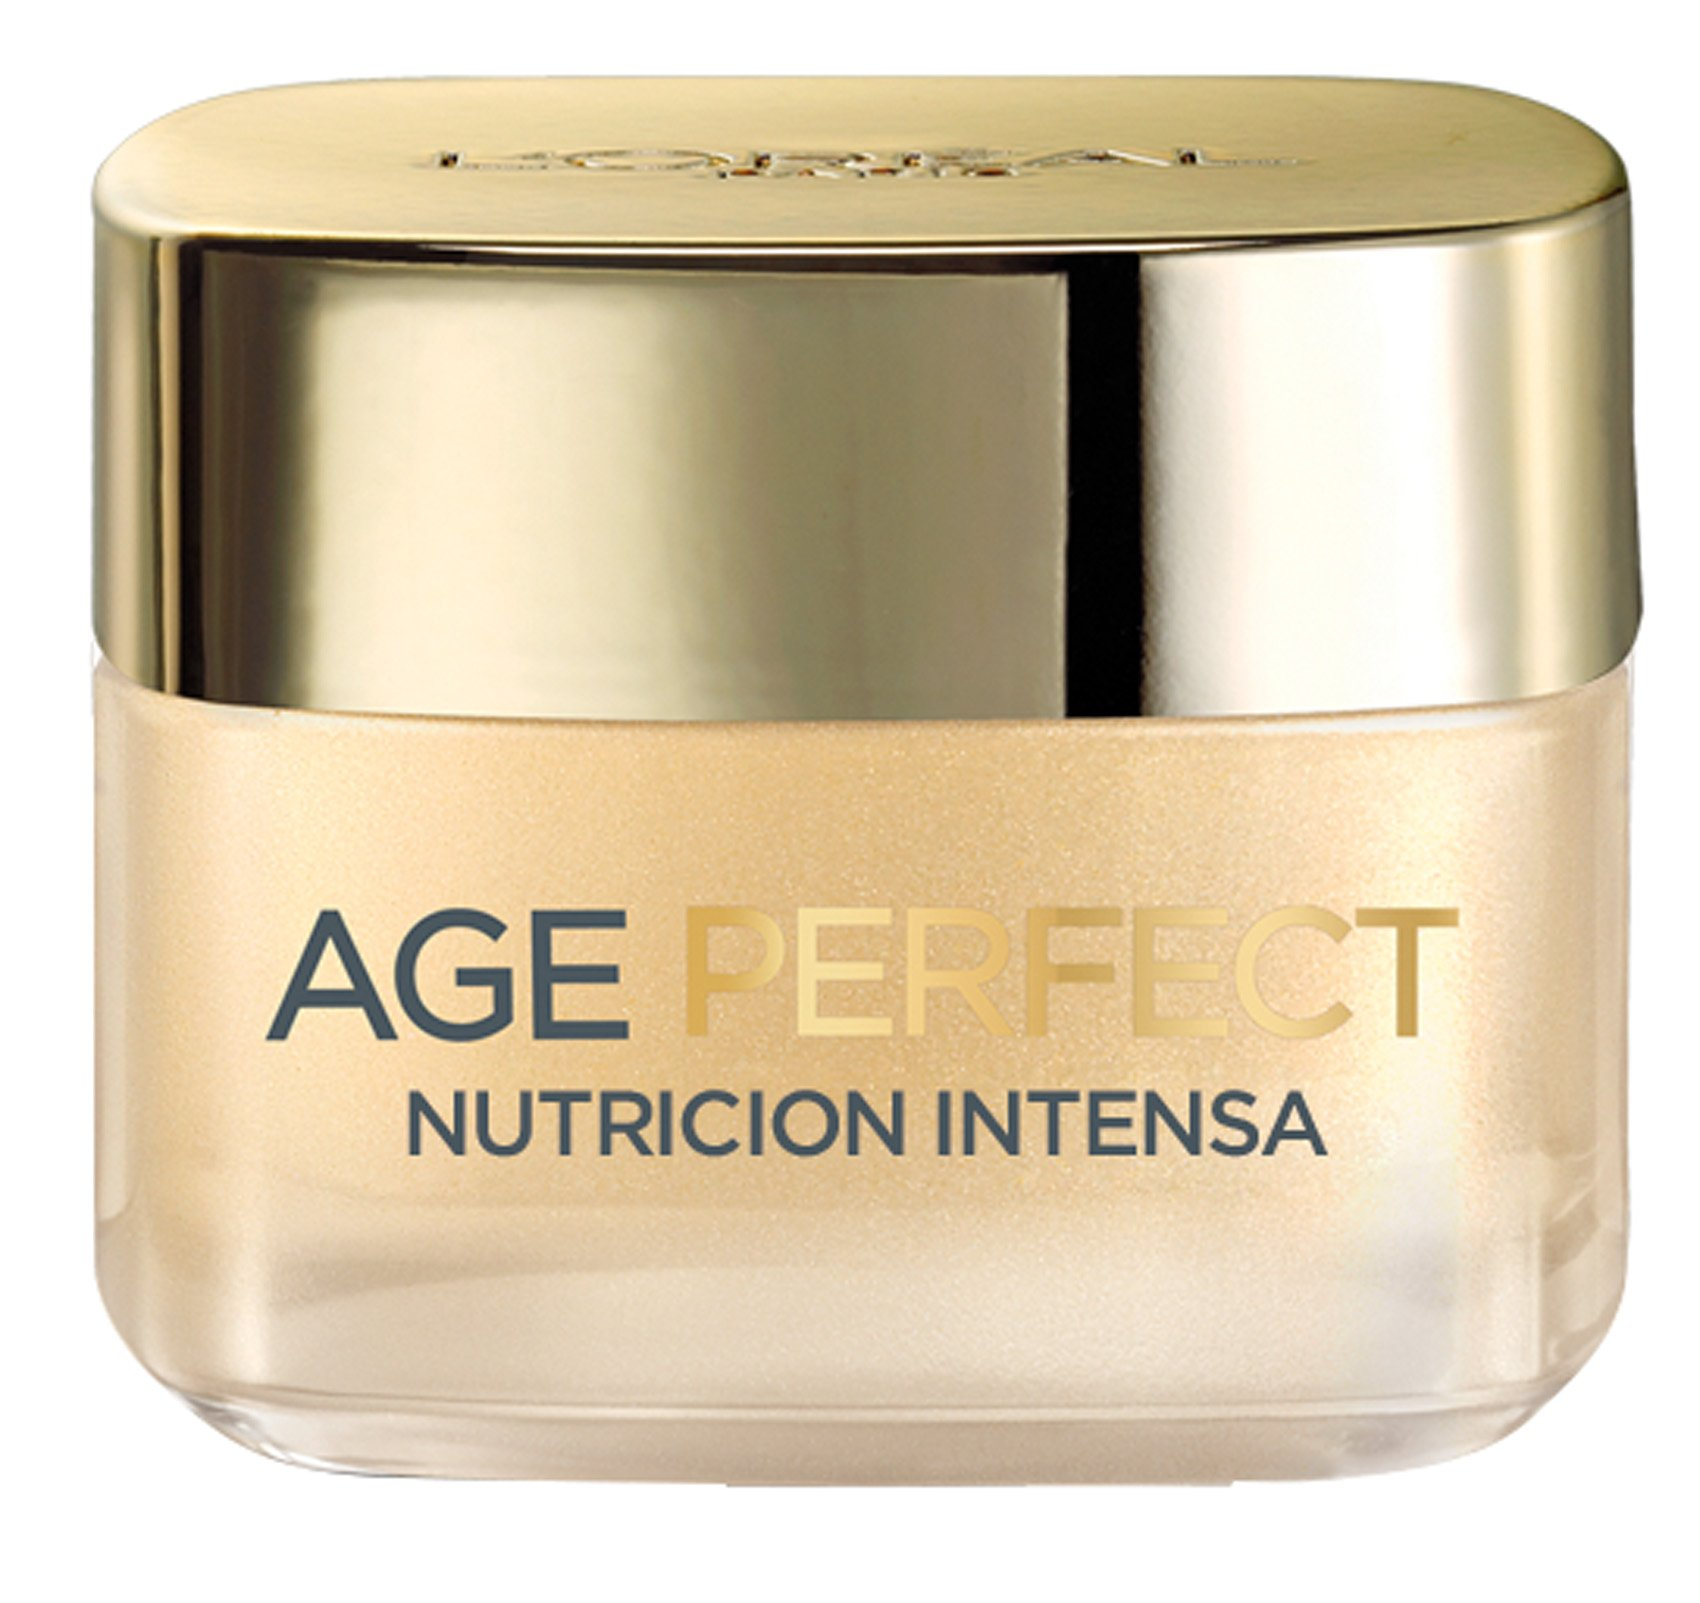 L'Oréal Paris Age Perfect Crema Nutrición Intensa De Día – 50 ml